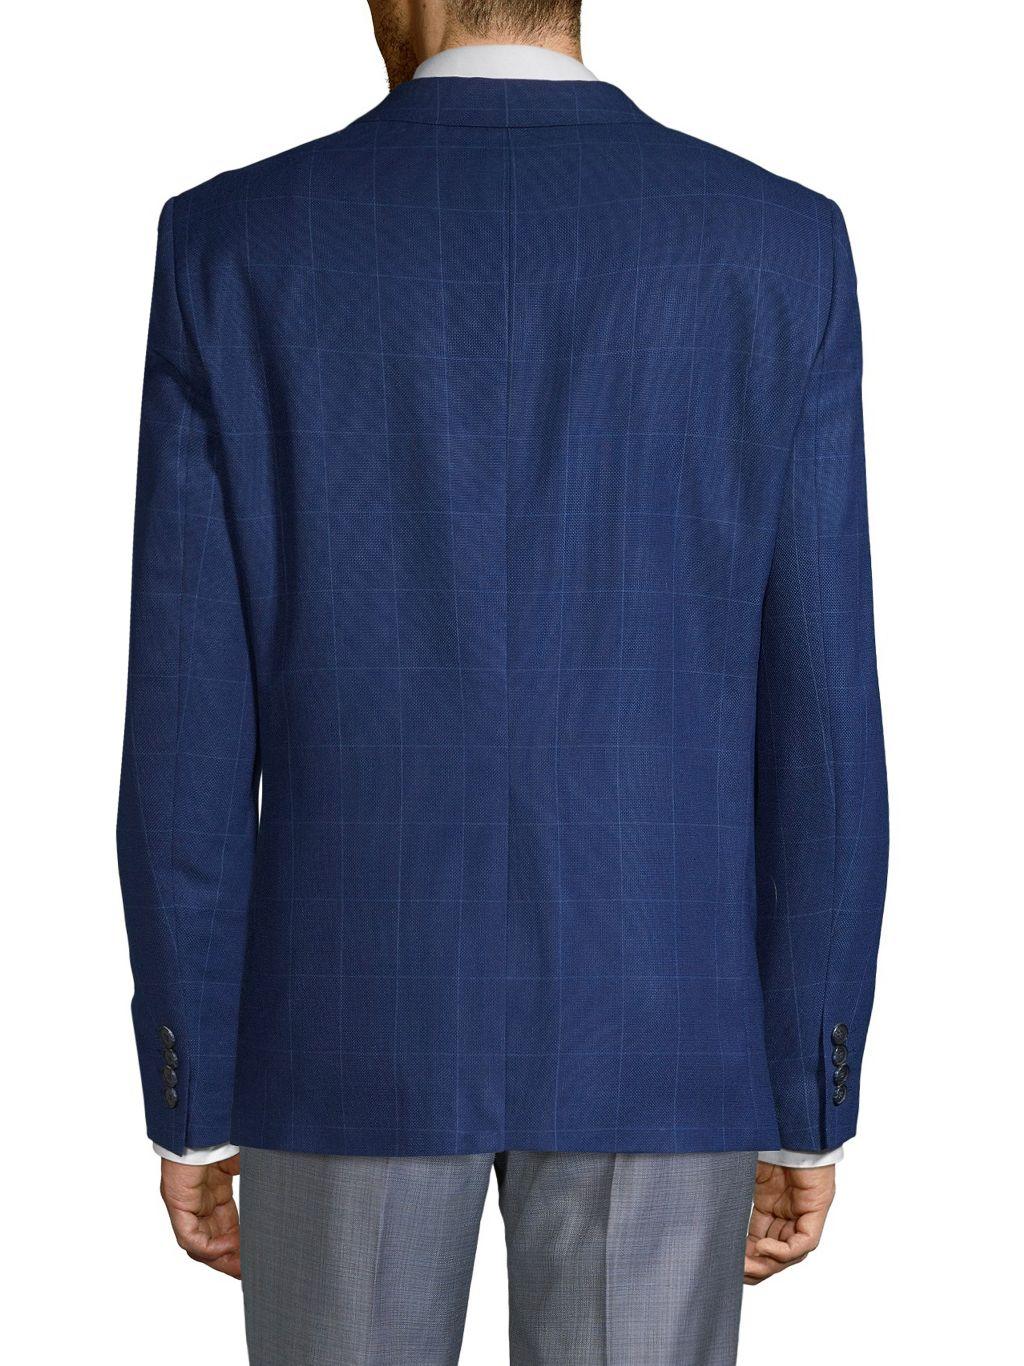 Karl Lagerfeld Textured Windowpane Wool Blend Jacket